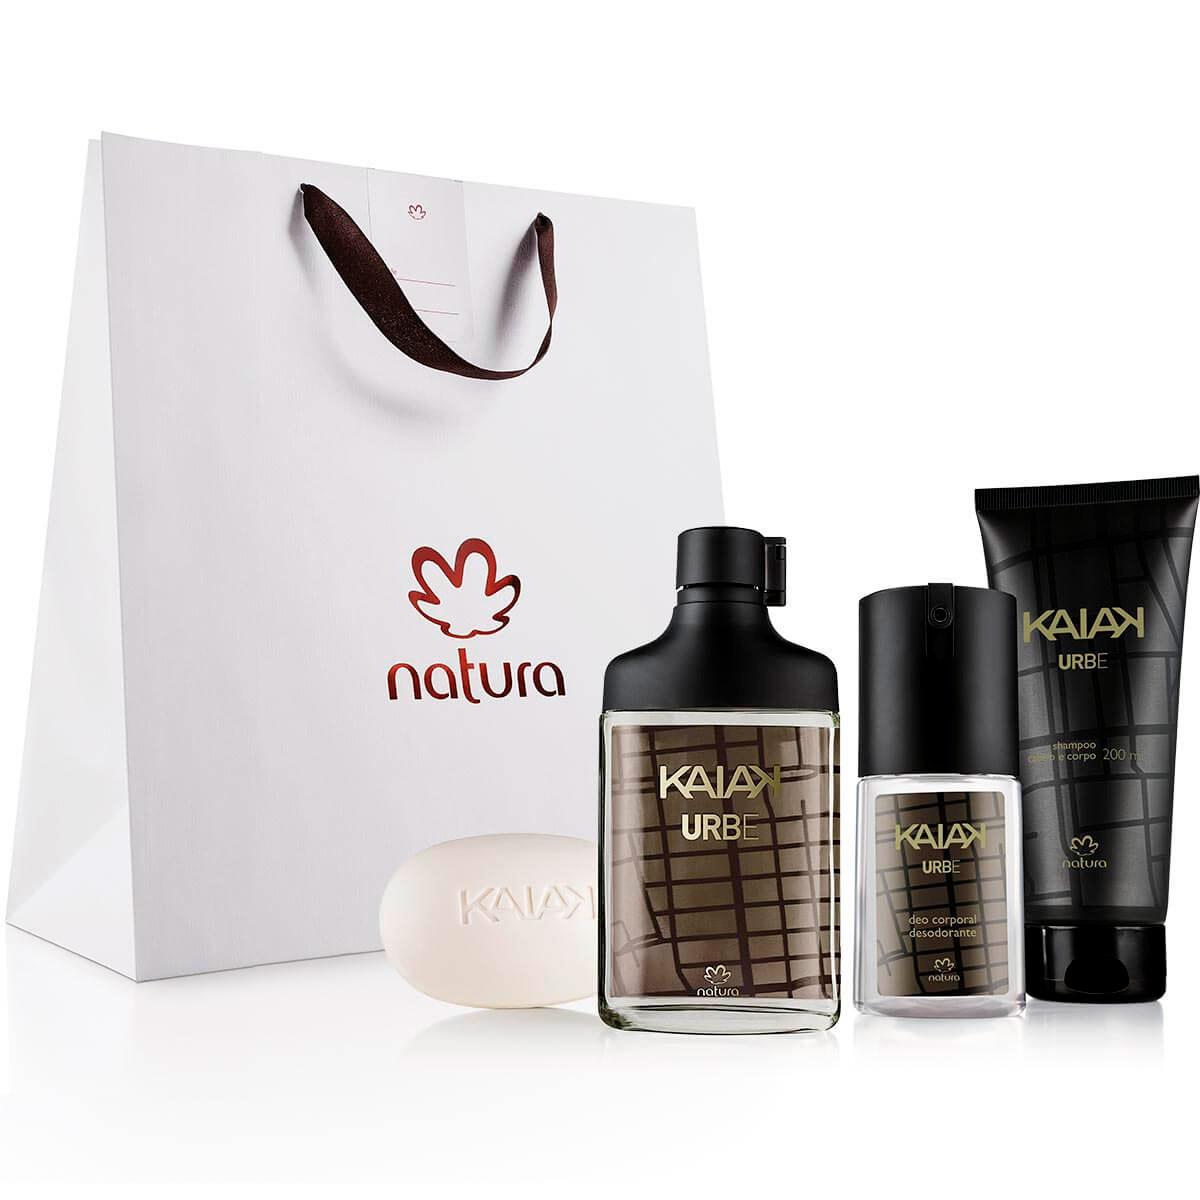 Presente Natura Kaiak Urbe - 85348